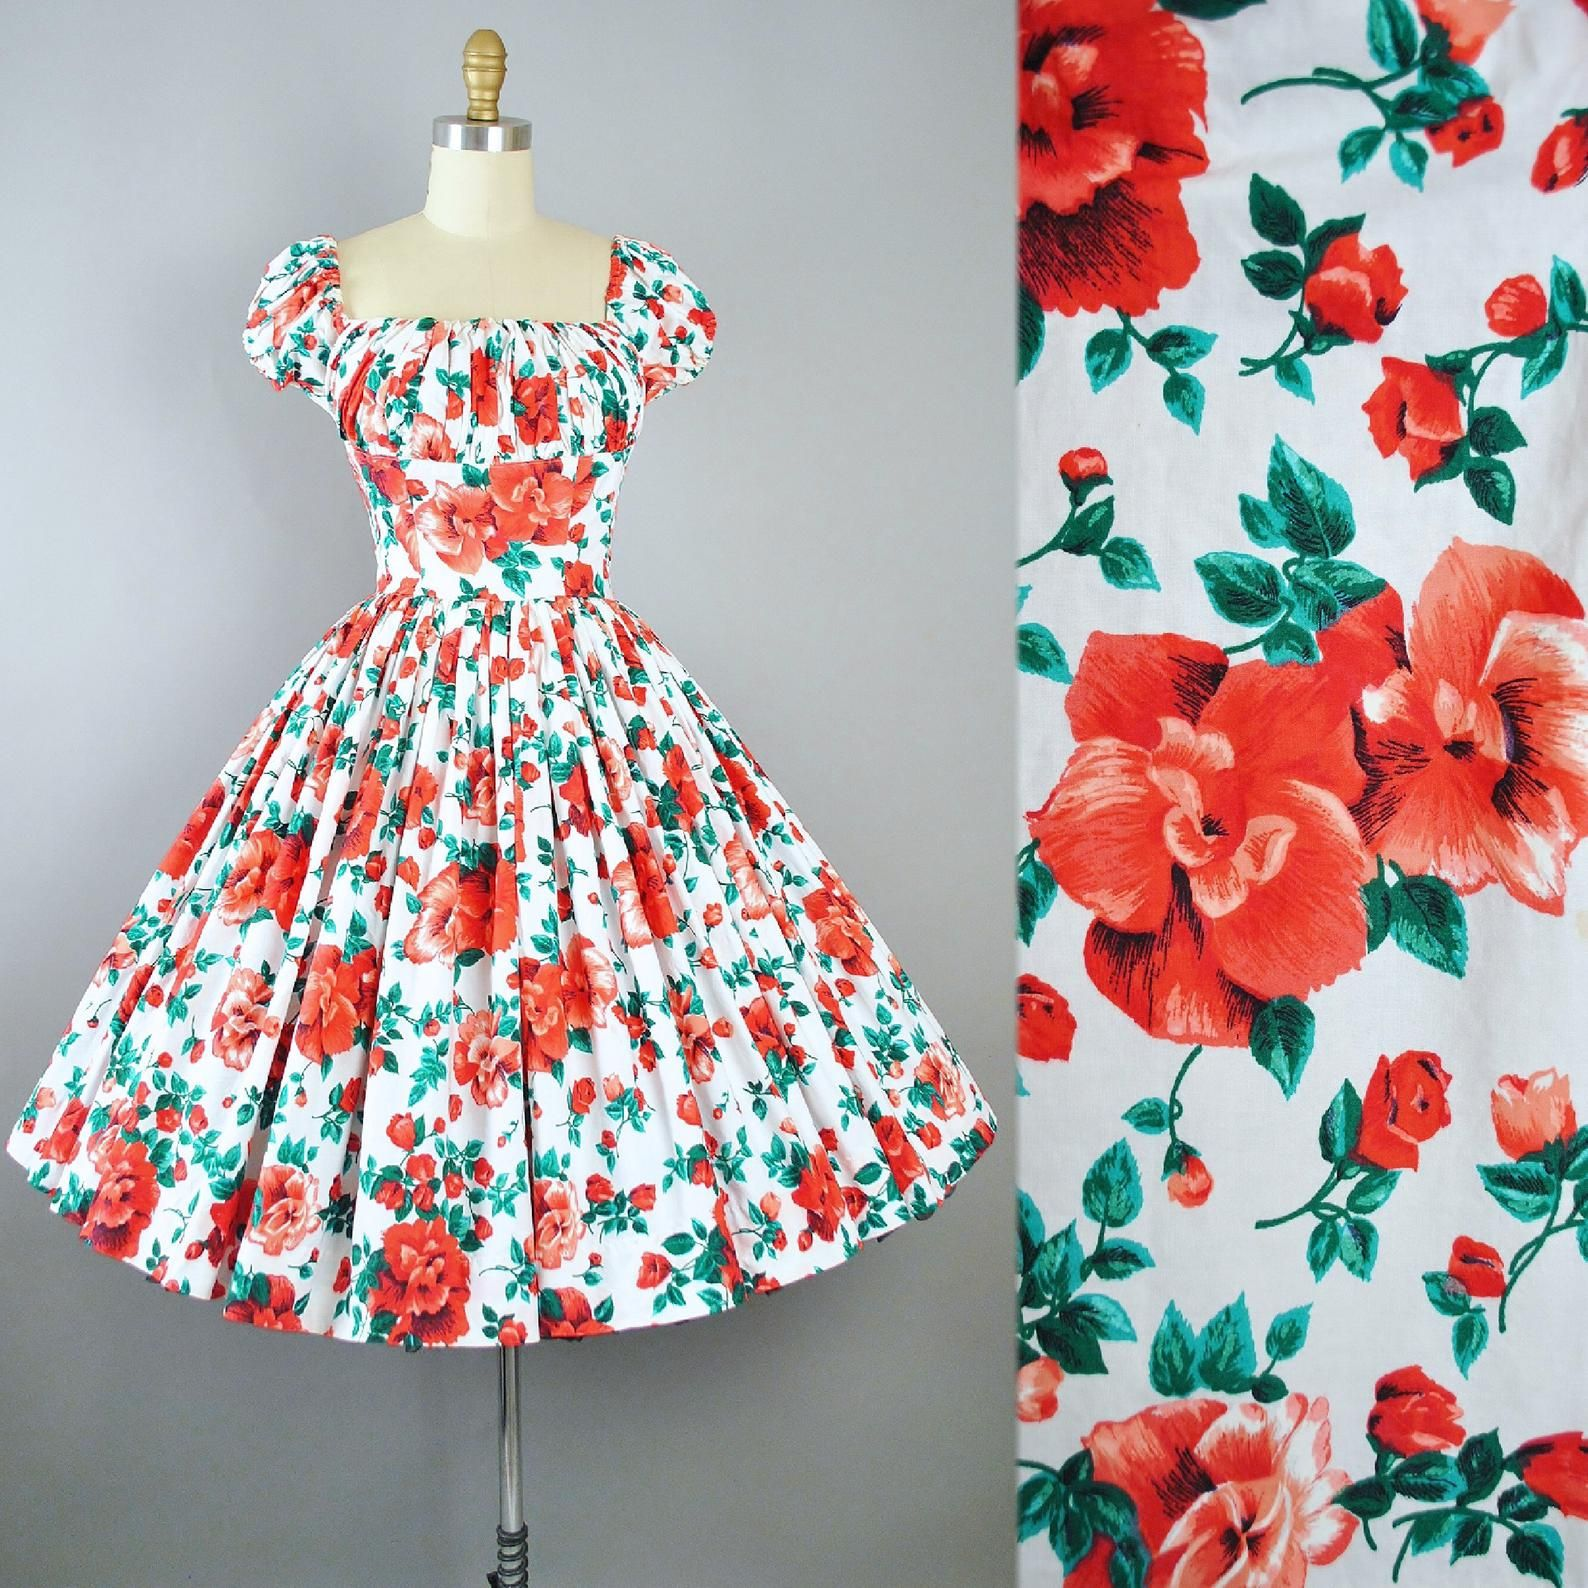 Pin On Vintage 1950s Dresses [ 1588 x 1588 Pixel ]